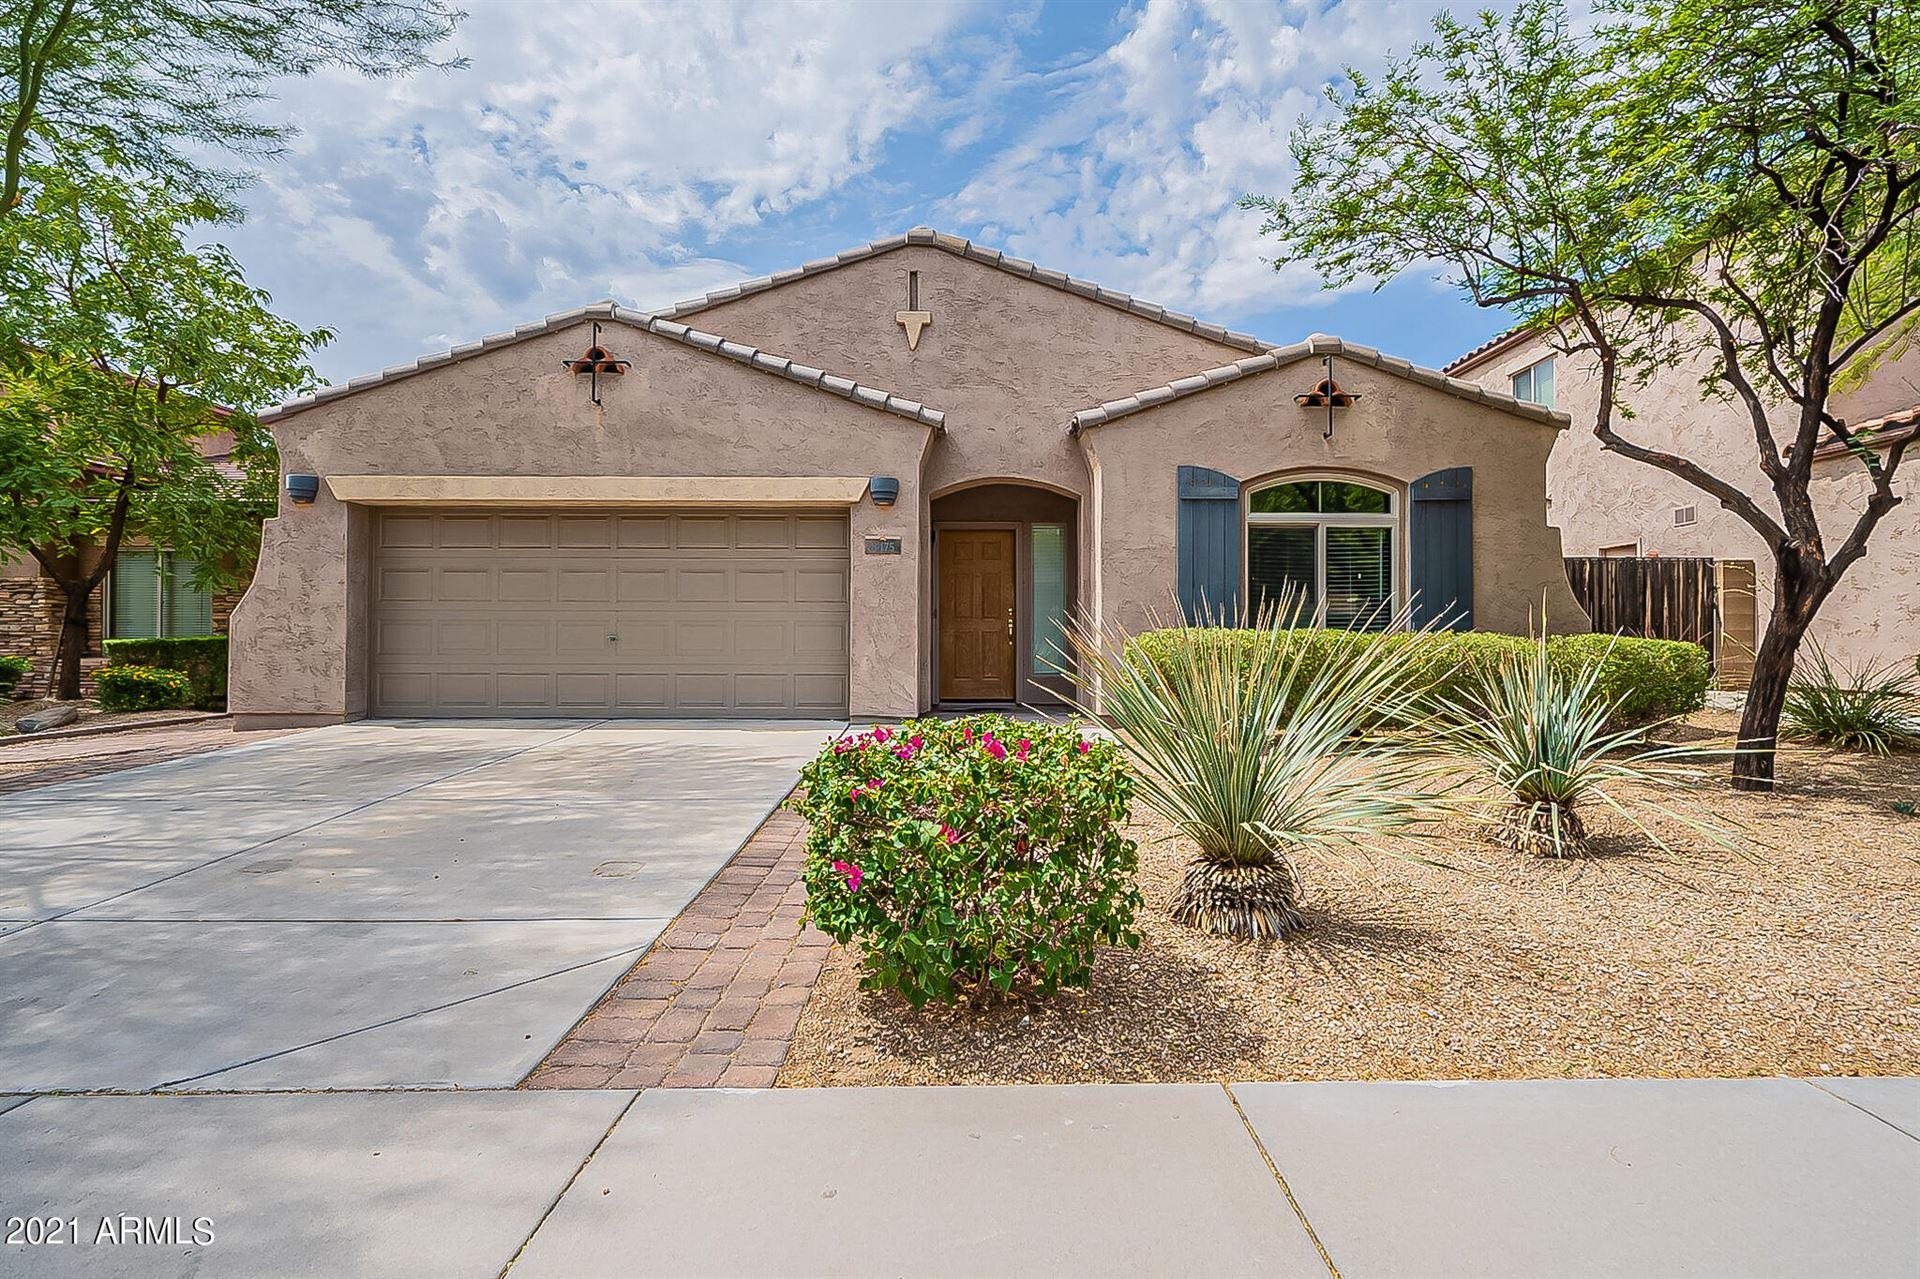 8475 W BAJADA Road, Peoria, AZ 85383 - MLS#: 6266569